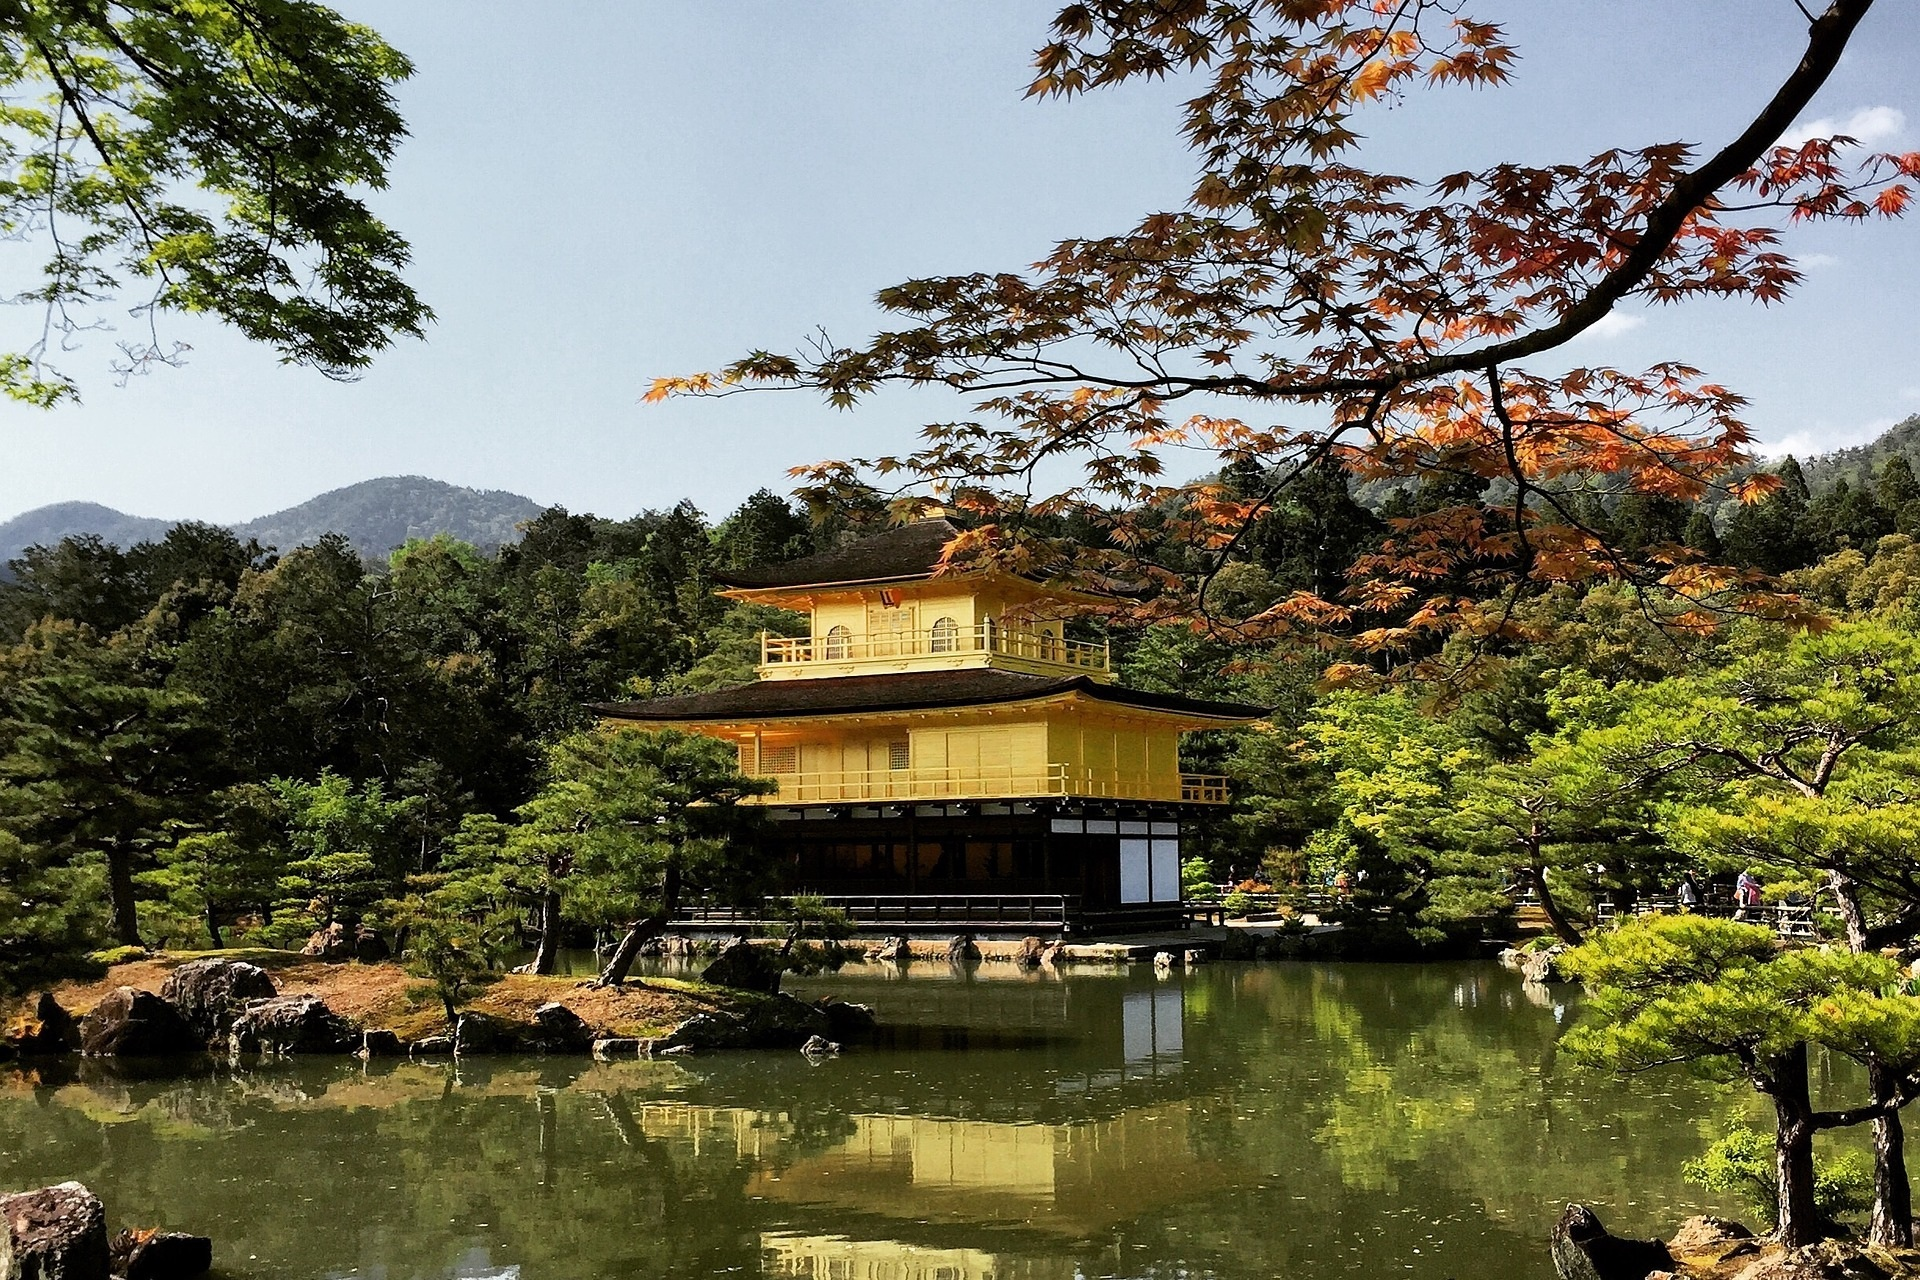 kyoto-827733_1920.jpg